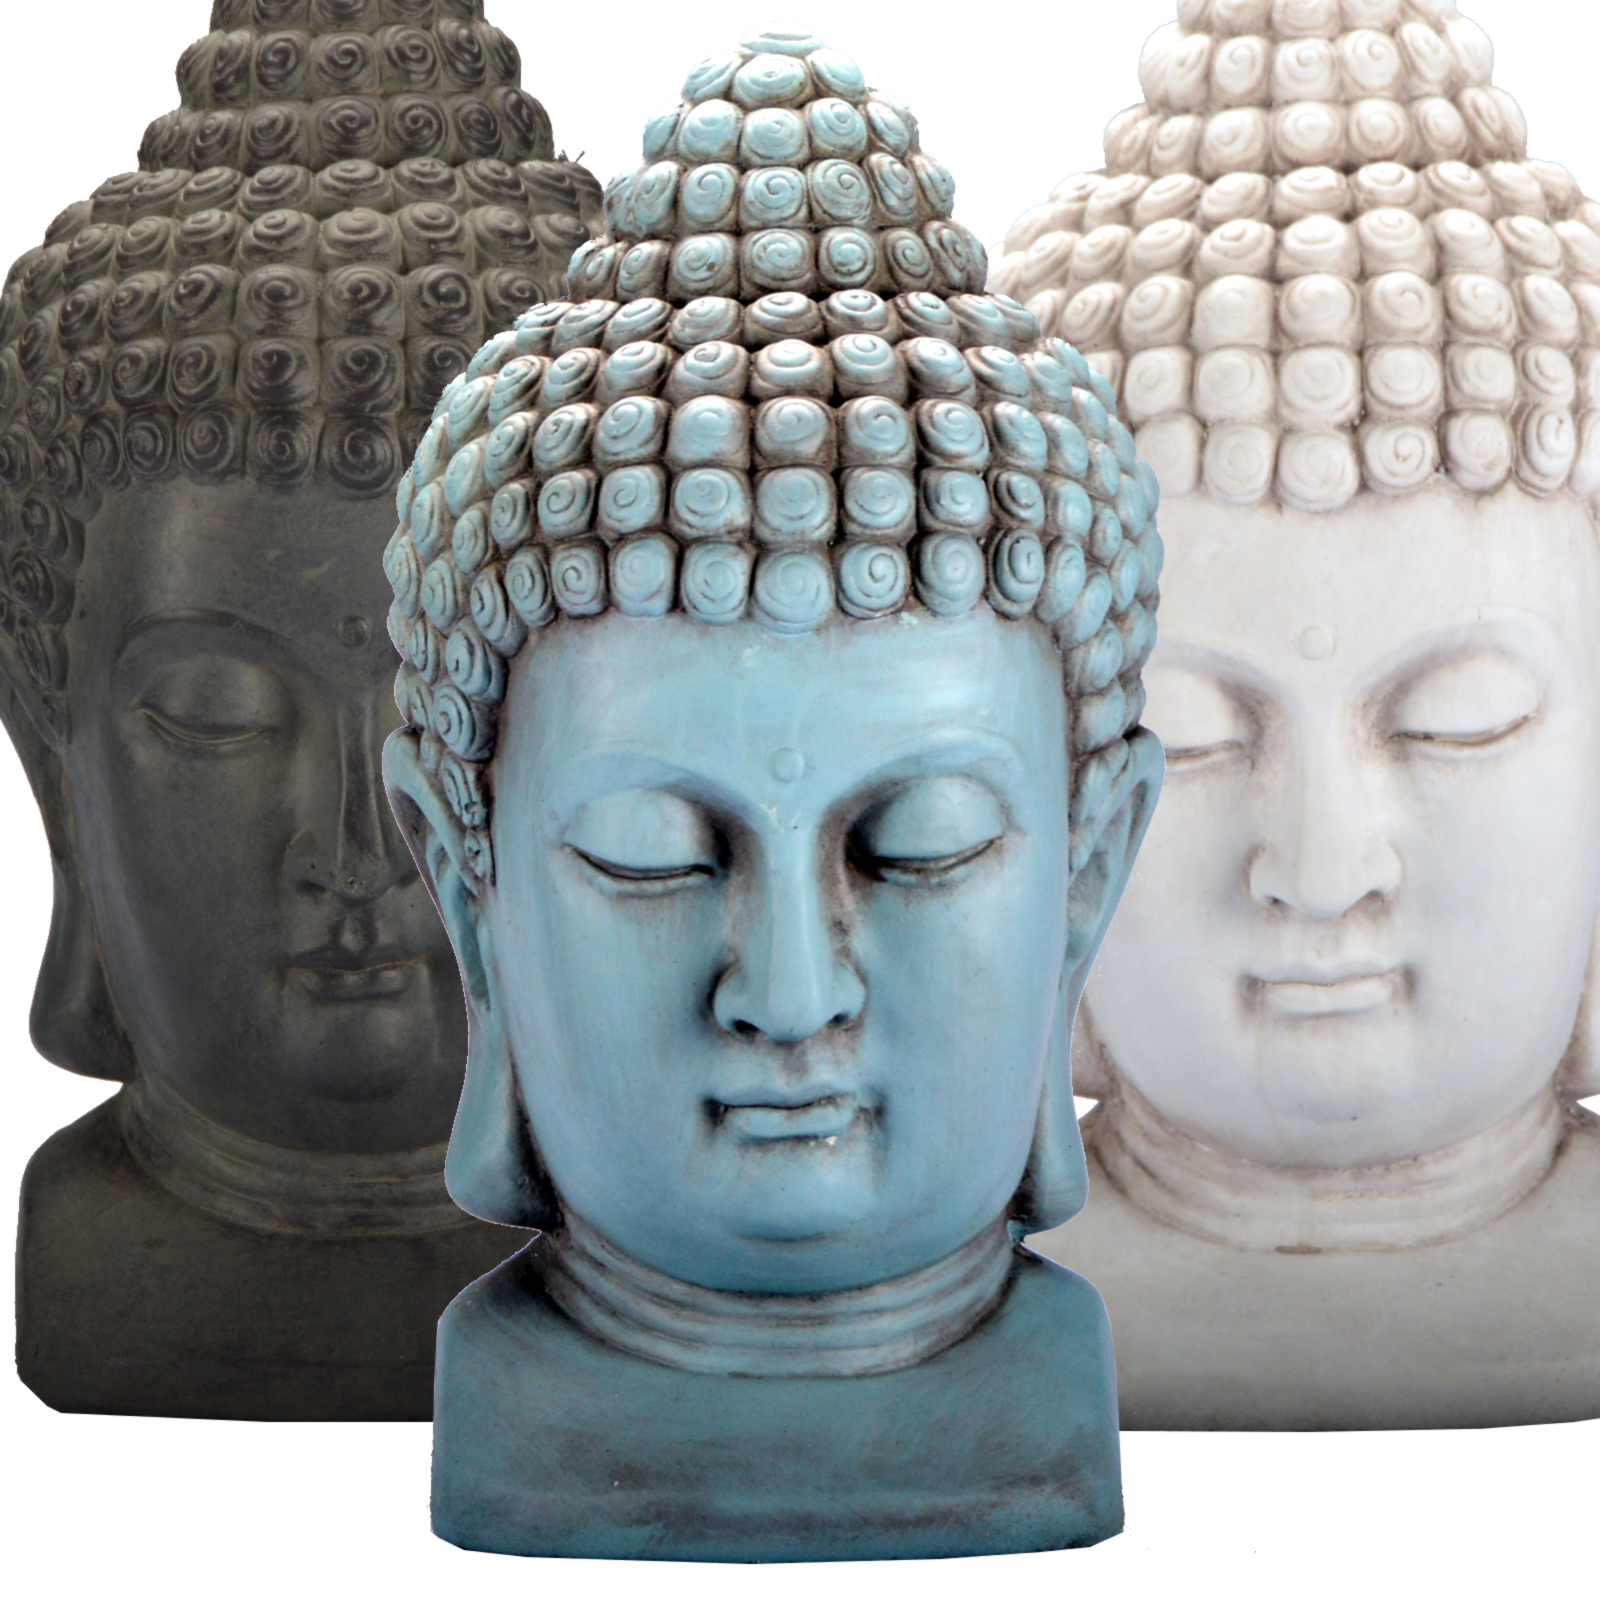 buddha kopf 3 farben figur dekoration innendekoration feng shui stein deko ebay. Black Bedroom Furniture Sets. Home Design Ideas